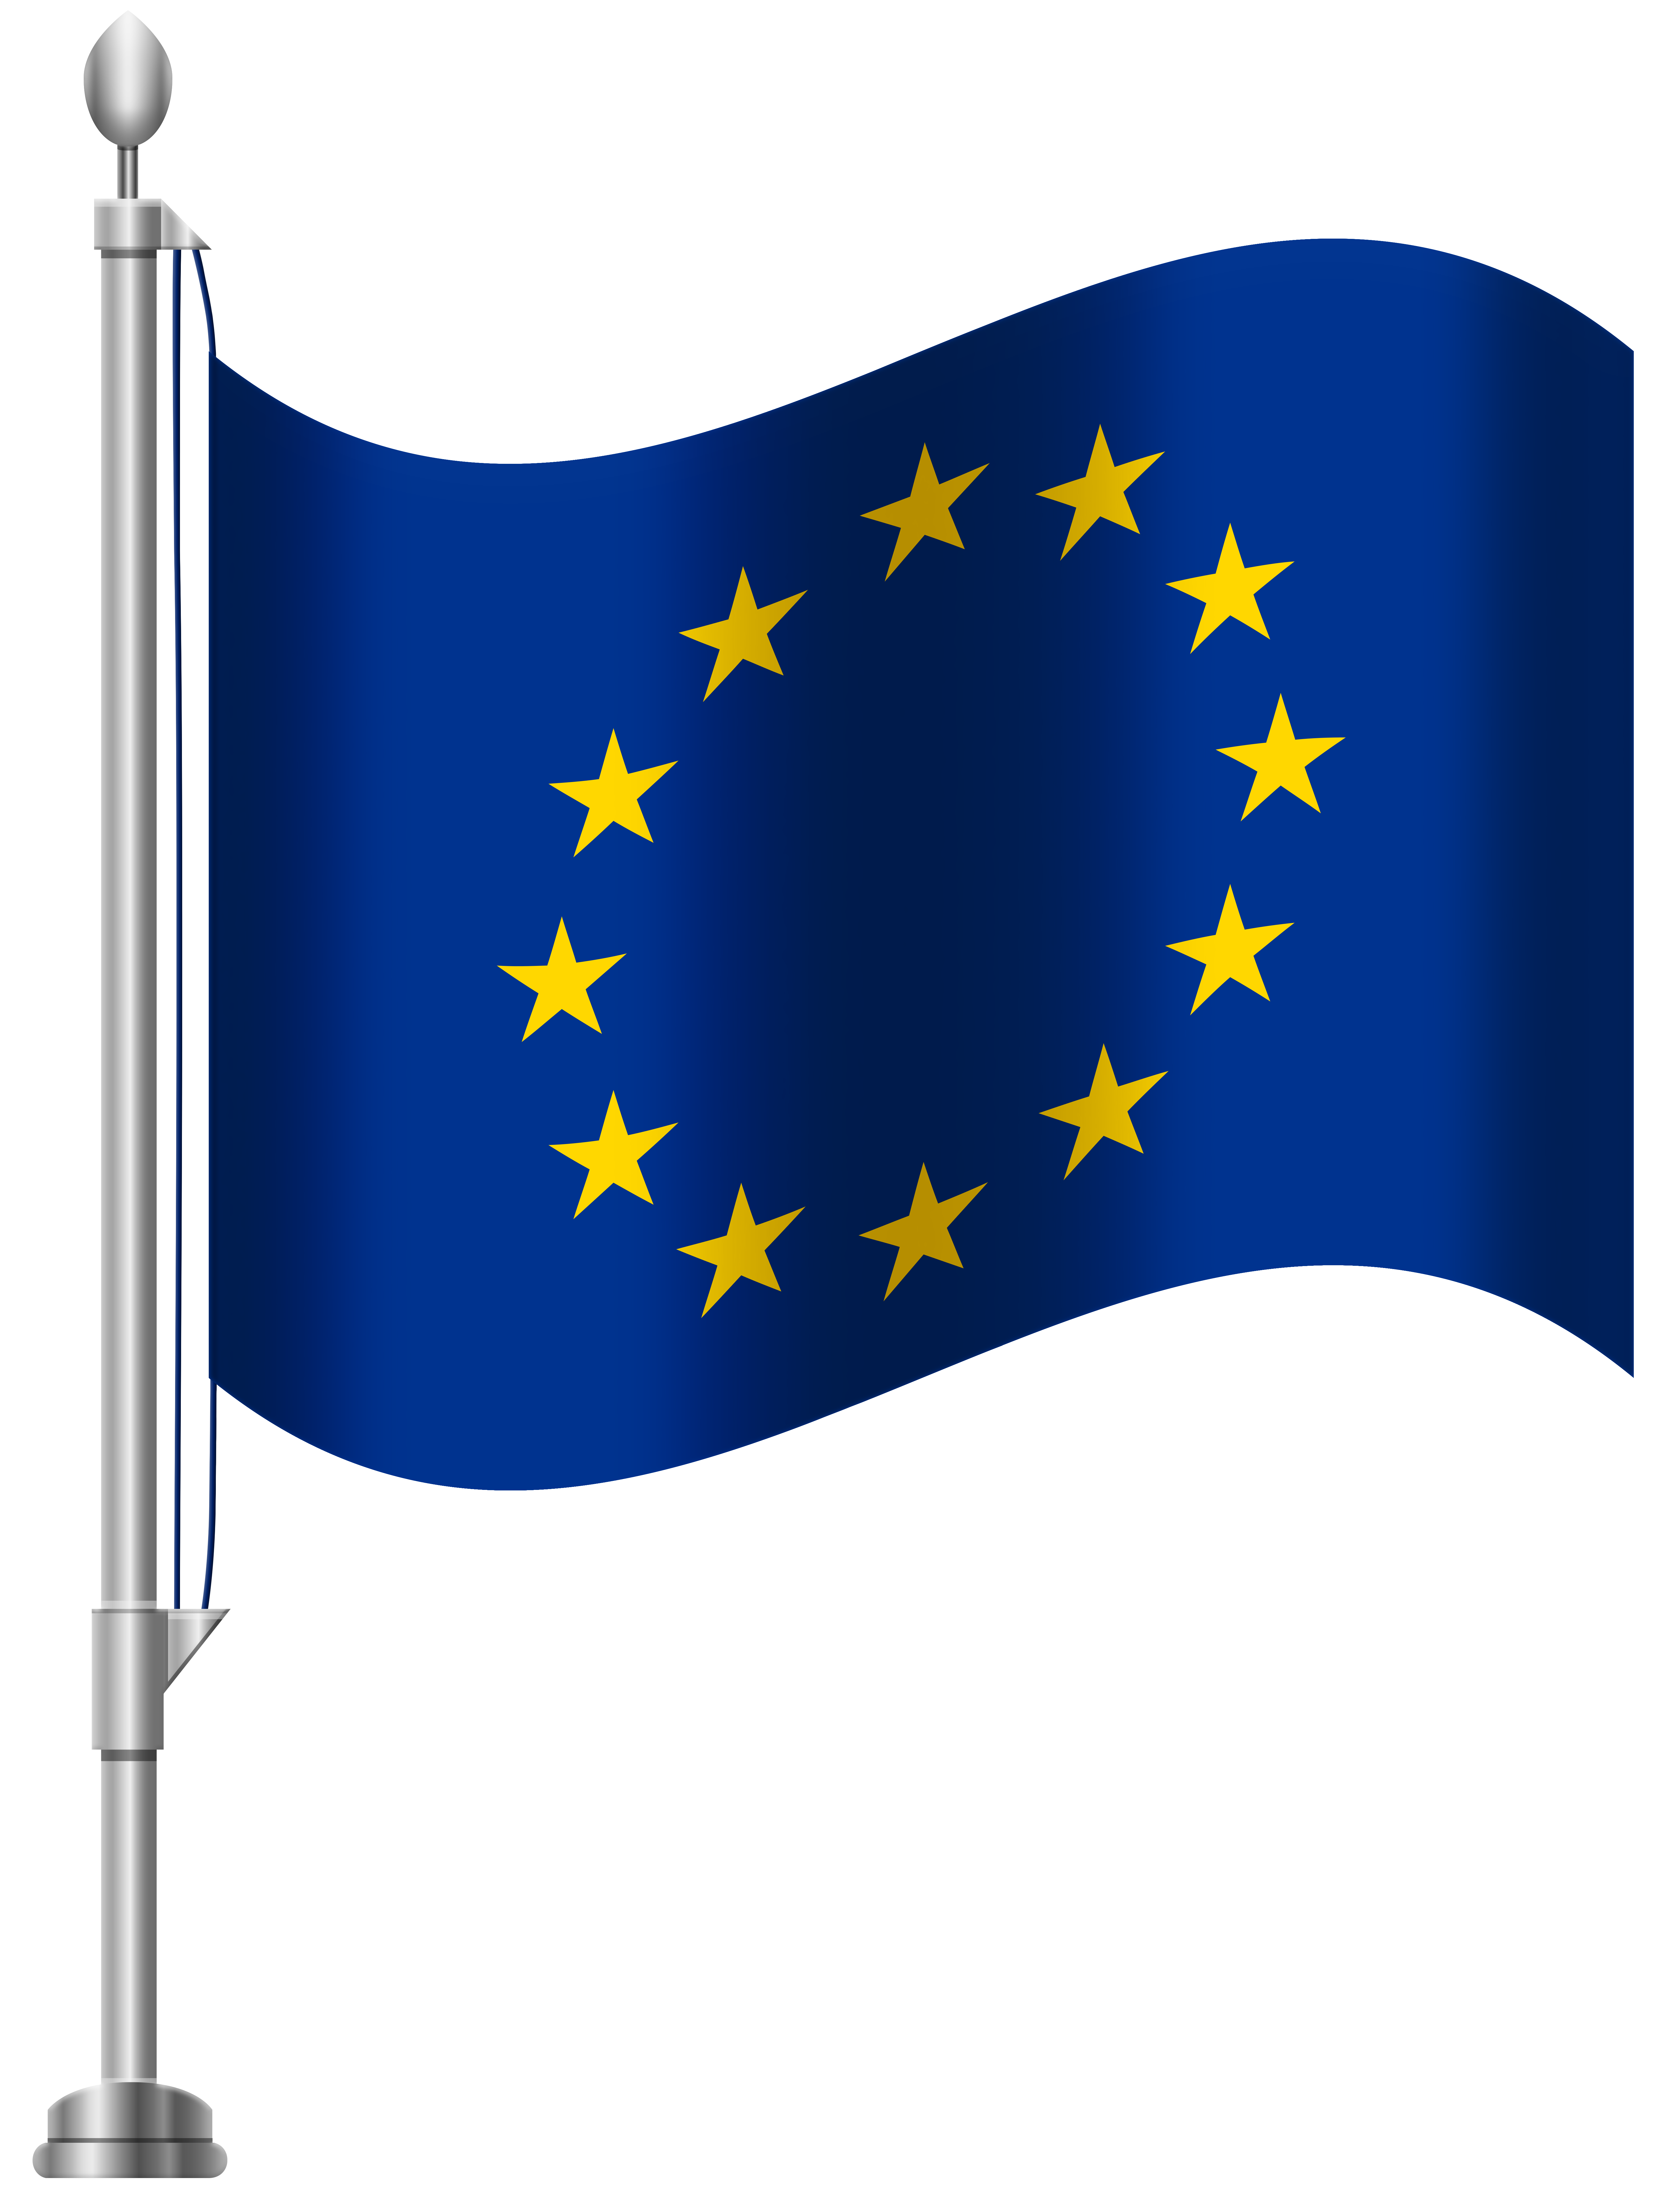 Union flag images clipart banner royalty free stock European Union Flag PNG Clip Art - Best WEB Clipart banner royalty free stock